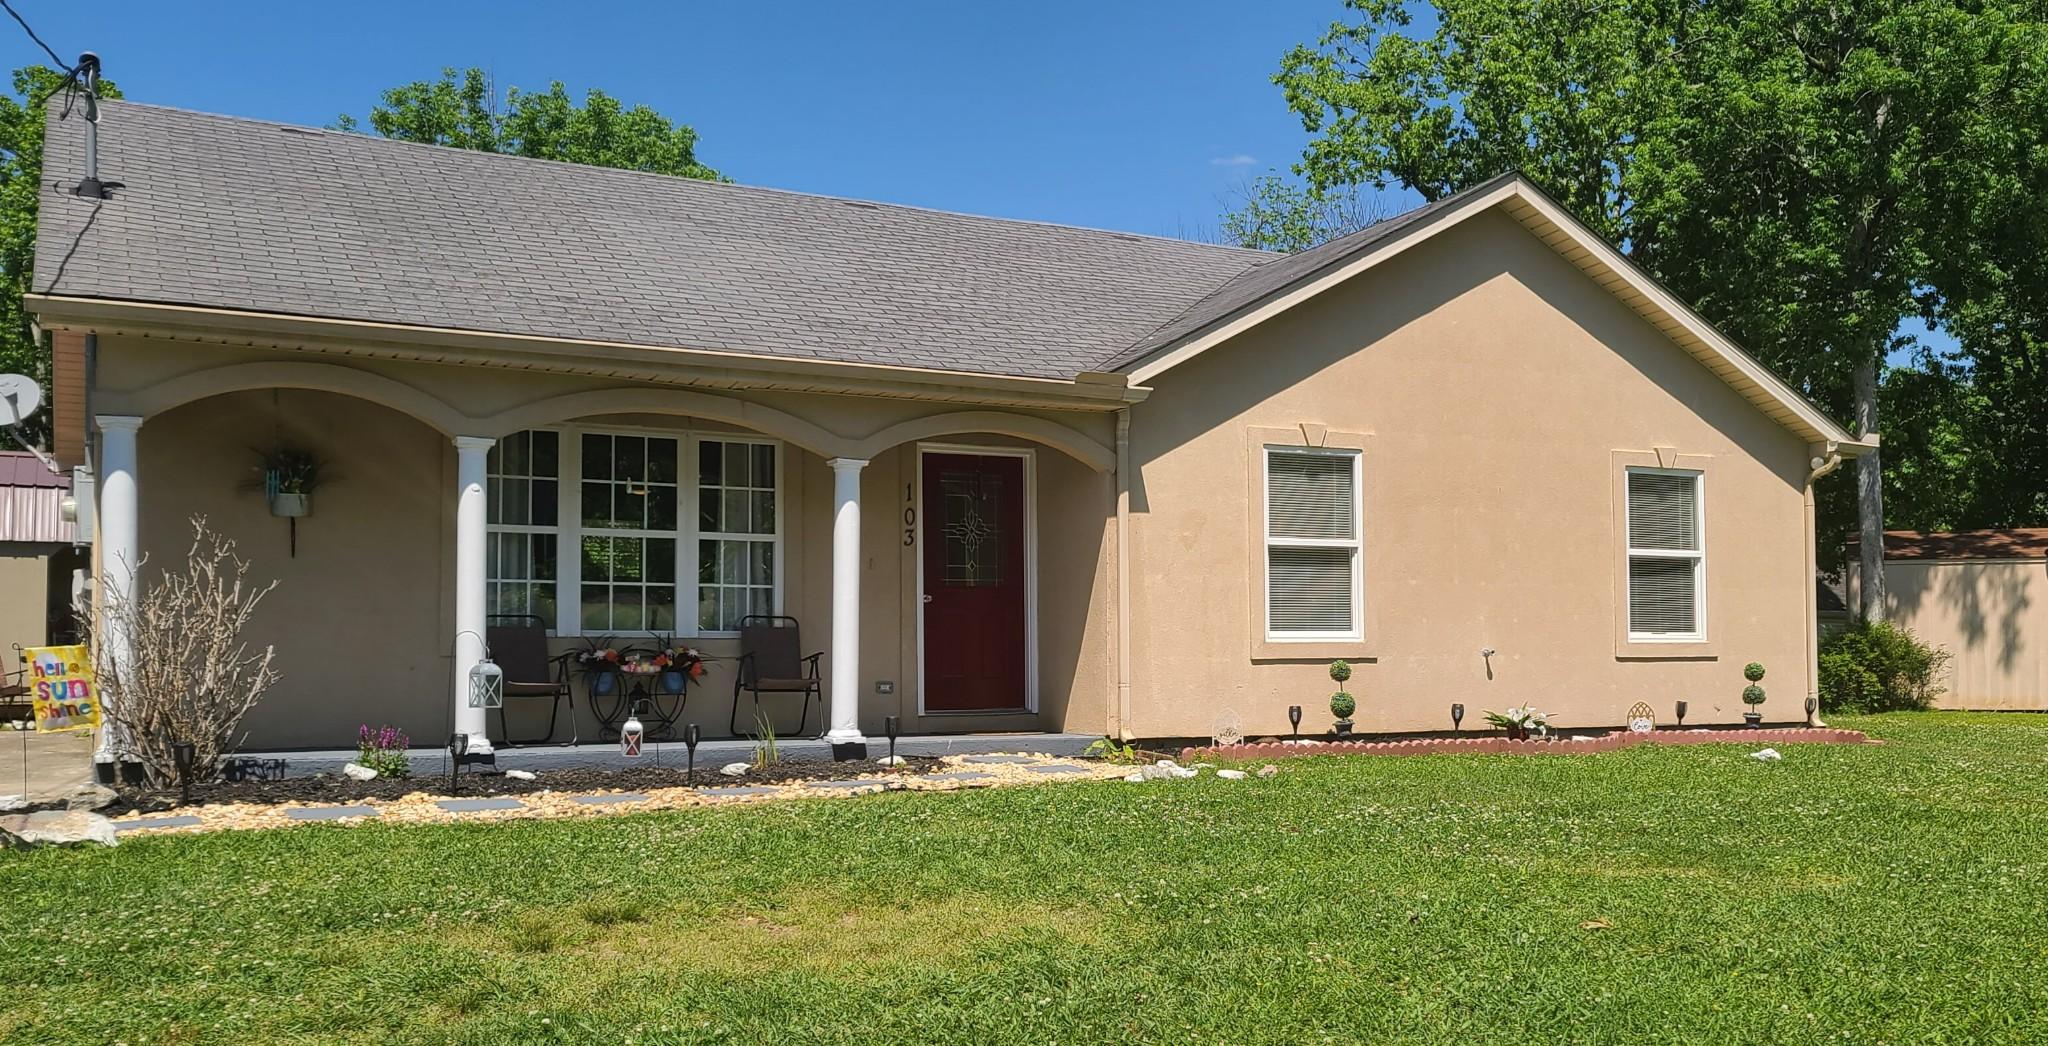 103 Whispering Oaks Dr Property Photo - Shelbyville, TN real estate listing